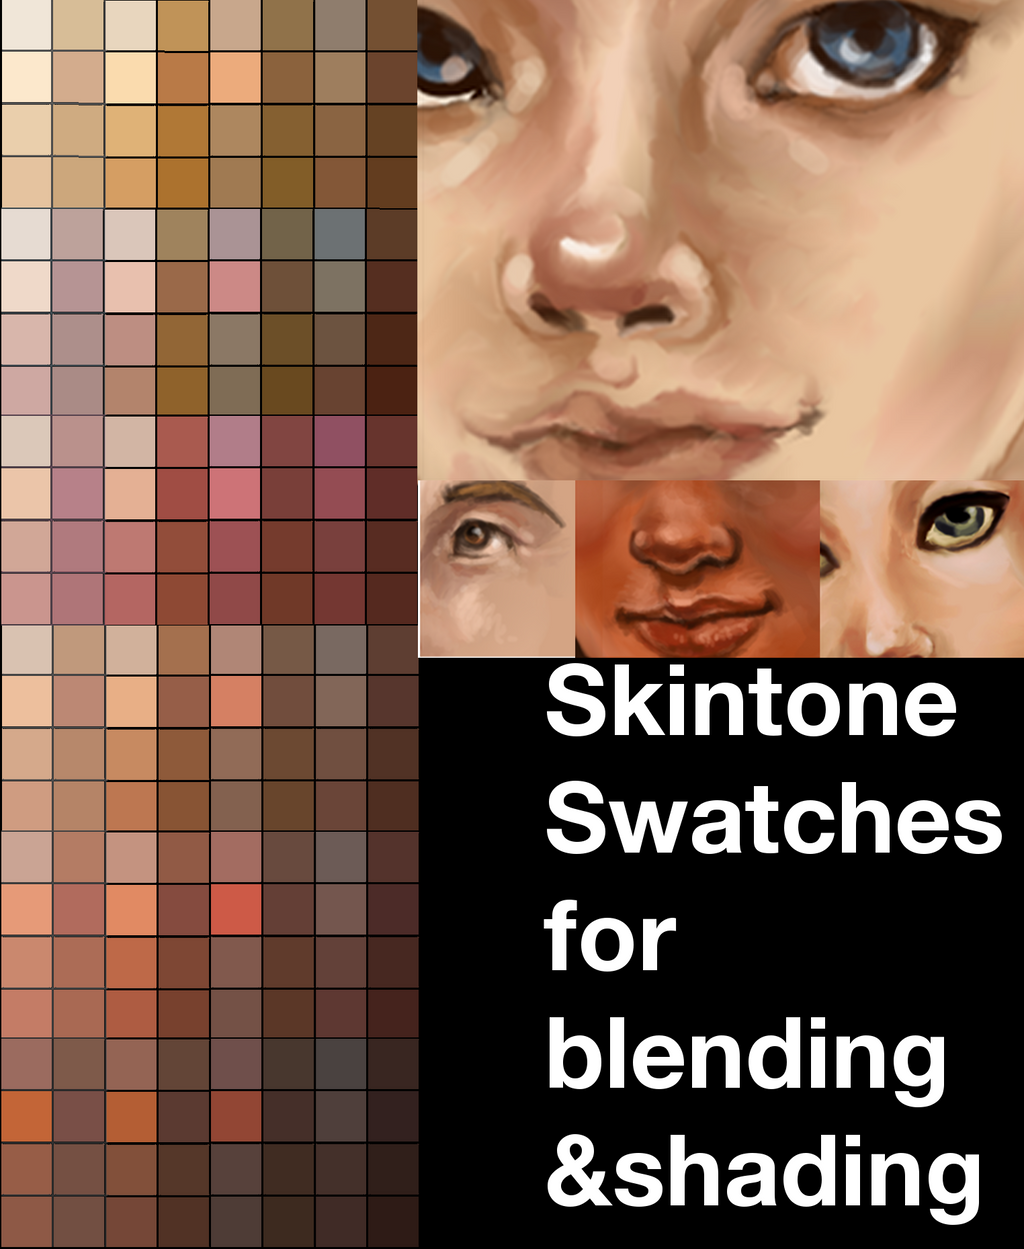 Skintone Swatches II by Xadrea